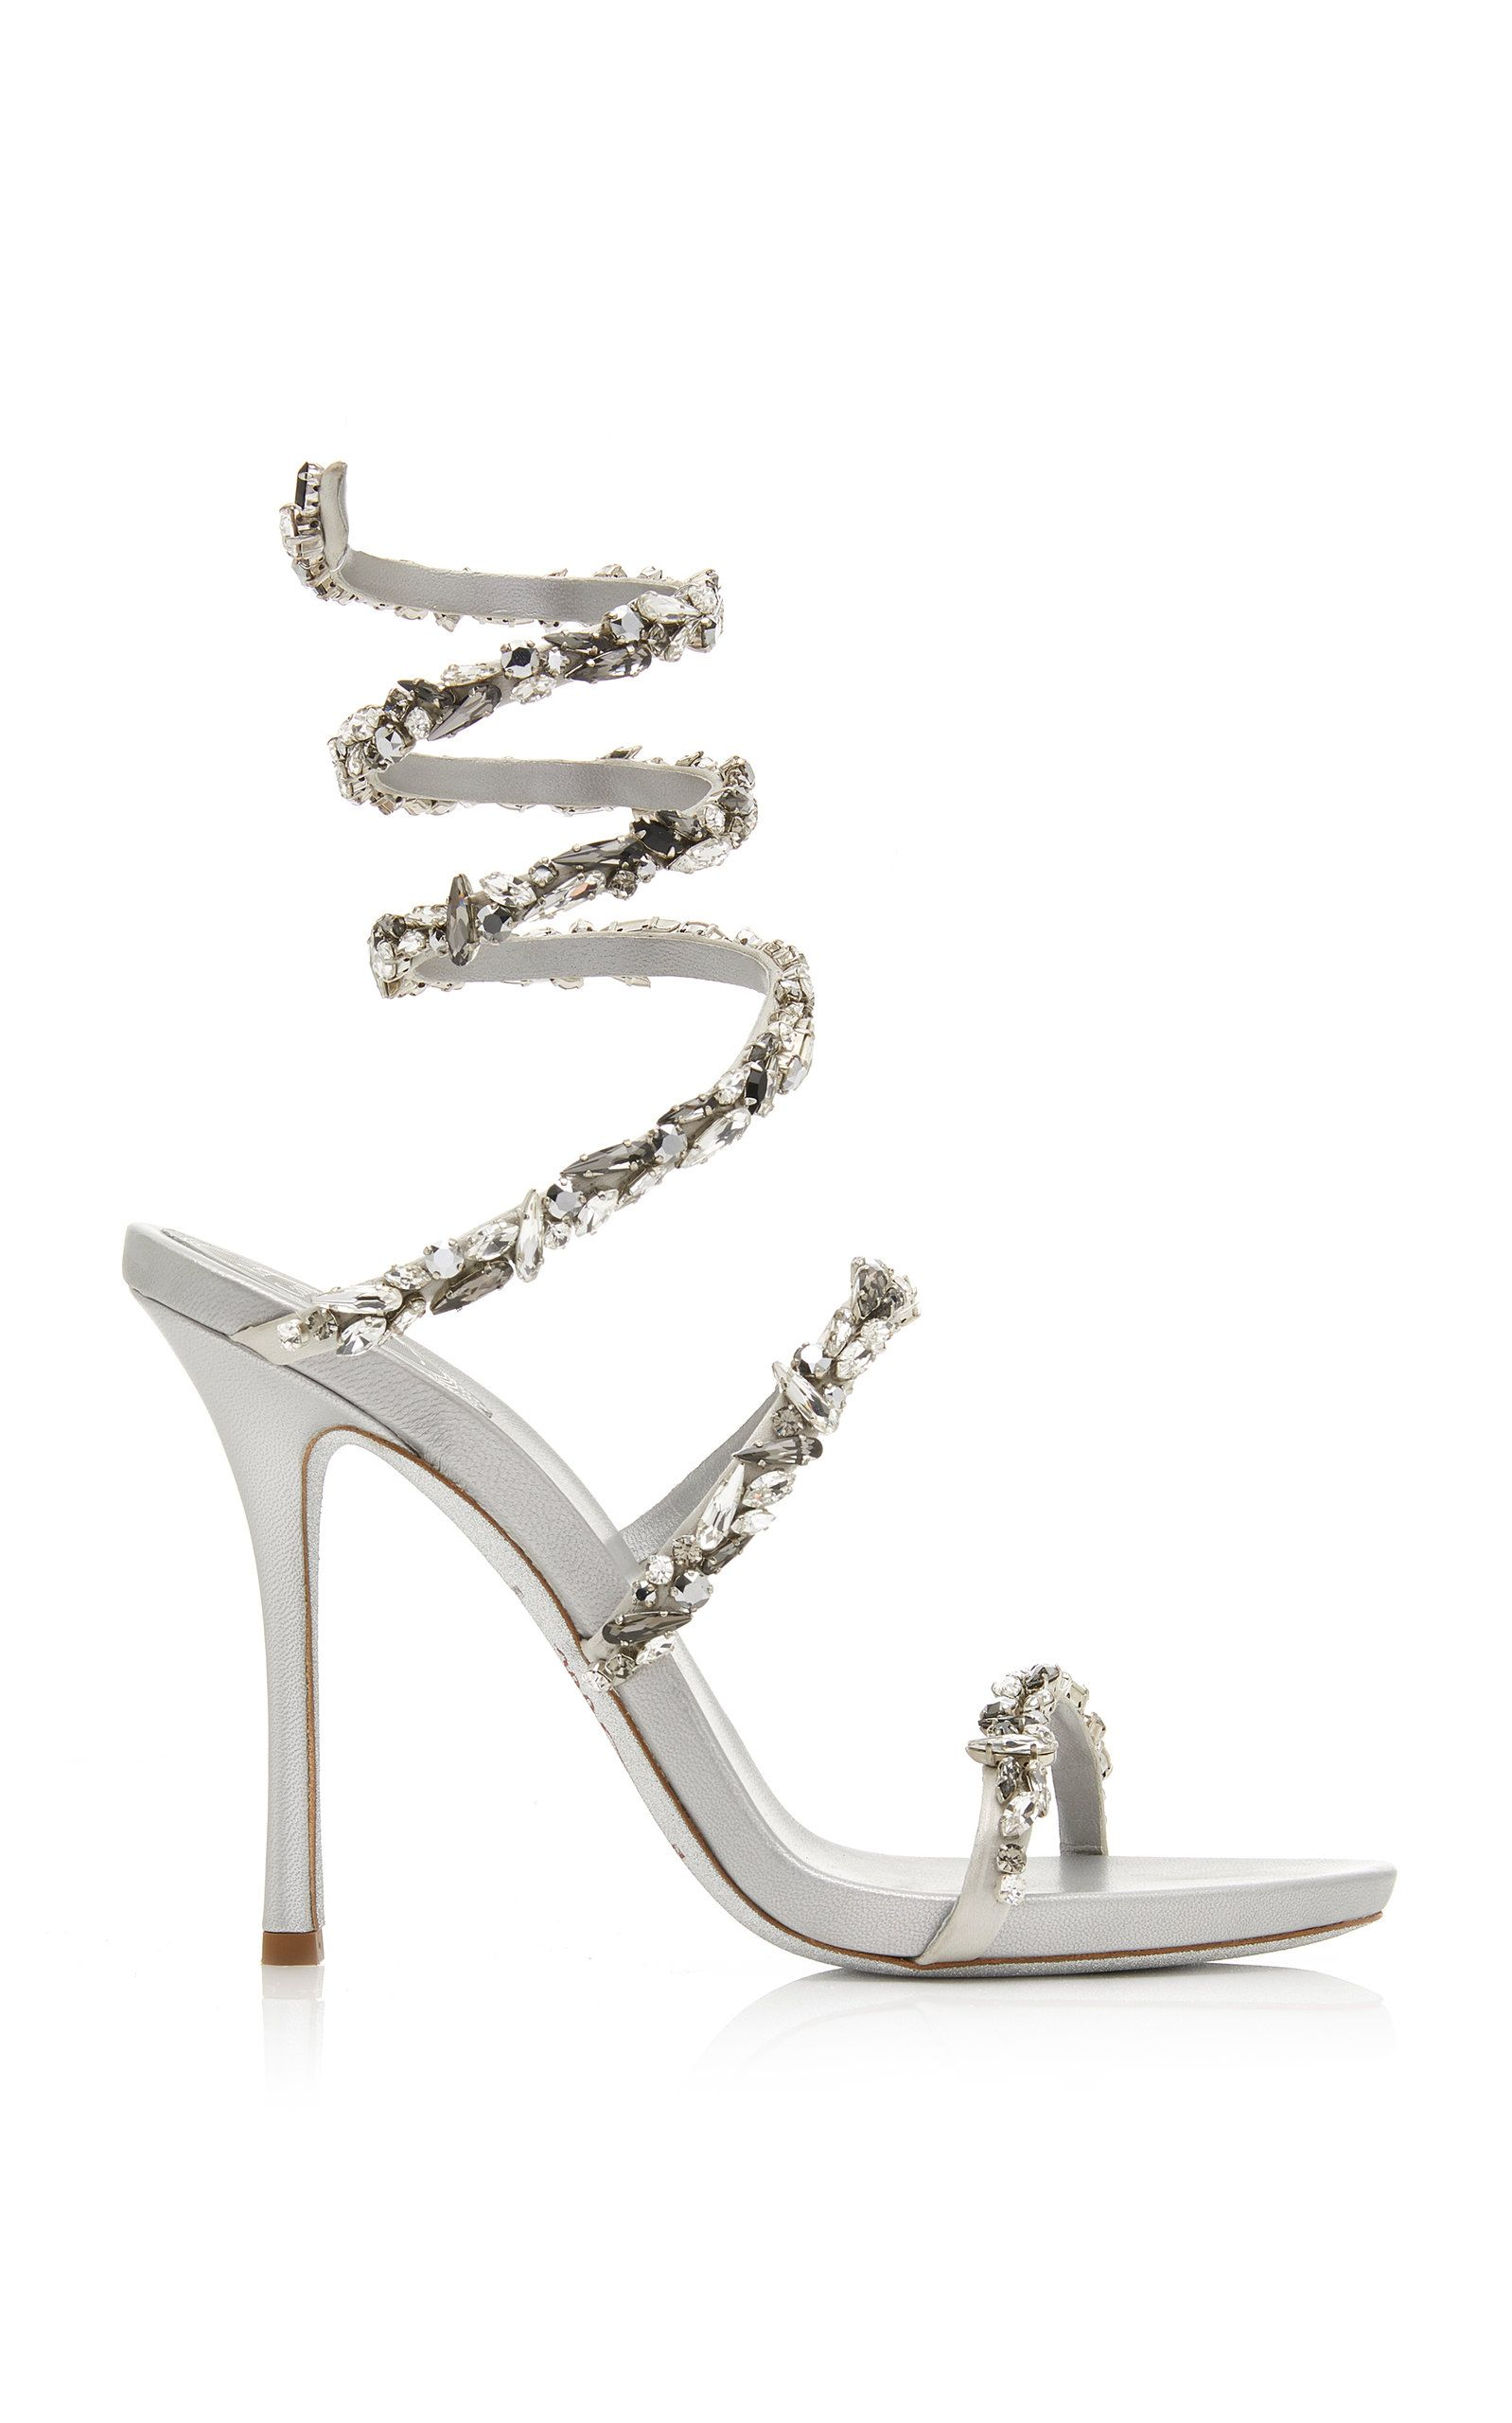 66 Best Wedding Shoes Of 2020 Designer Bridal Heels And Flats